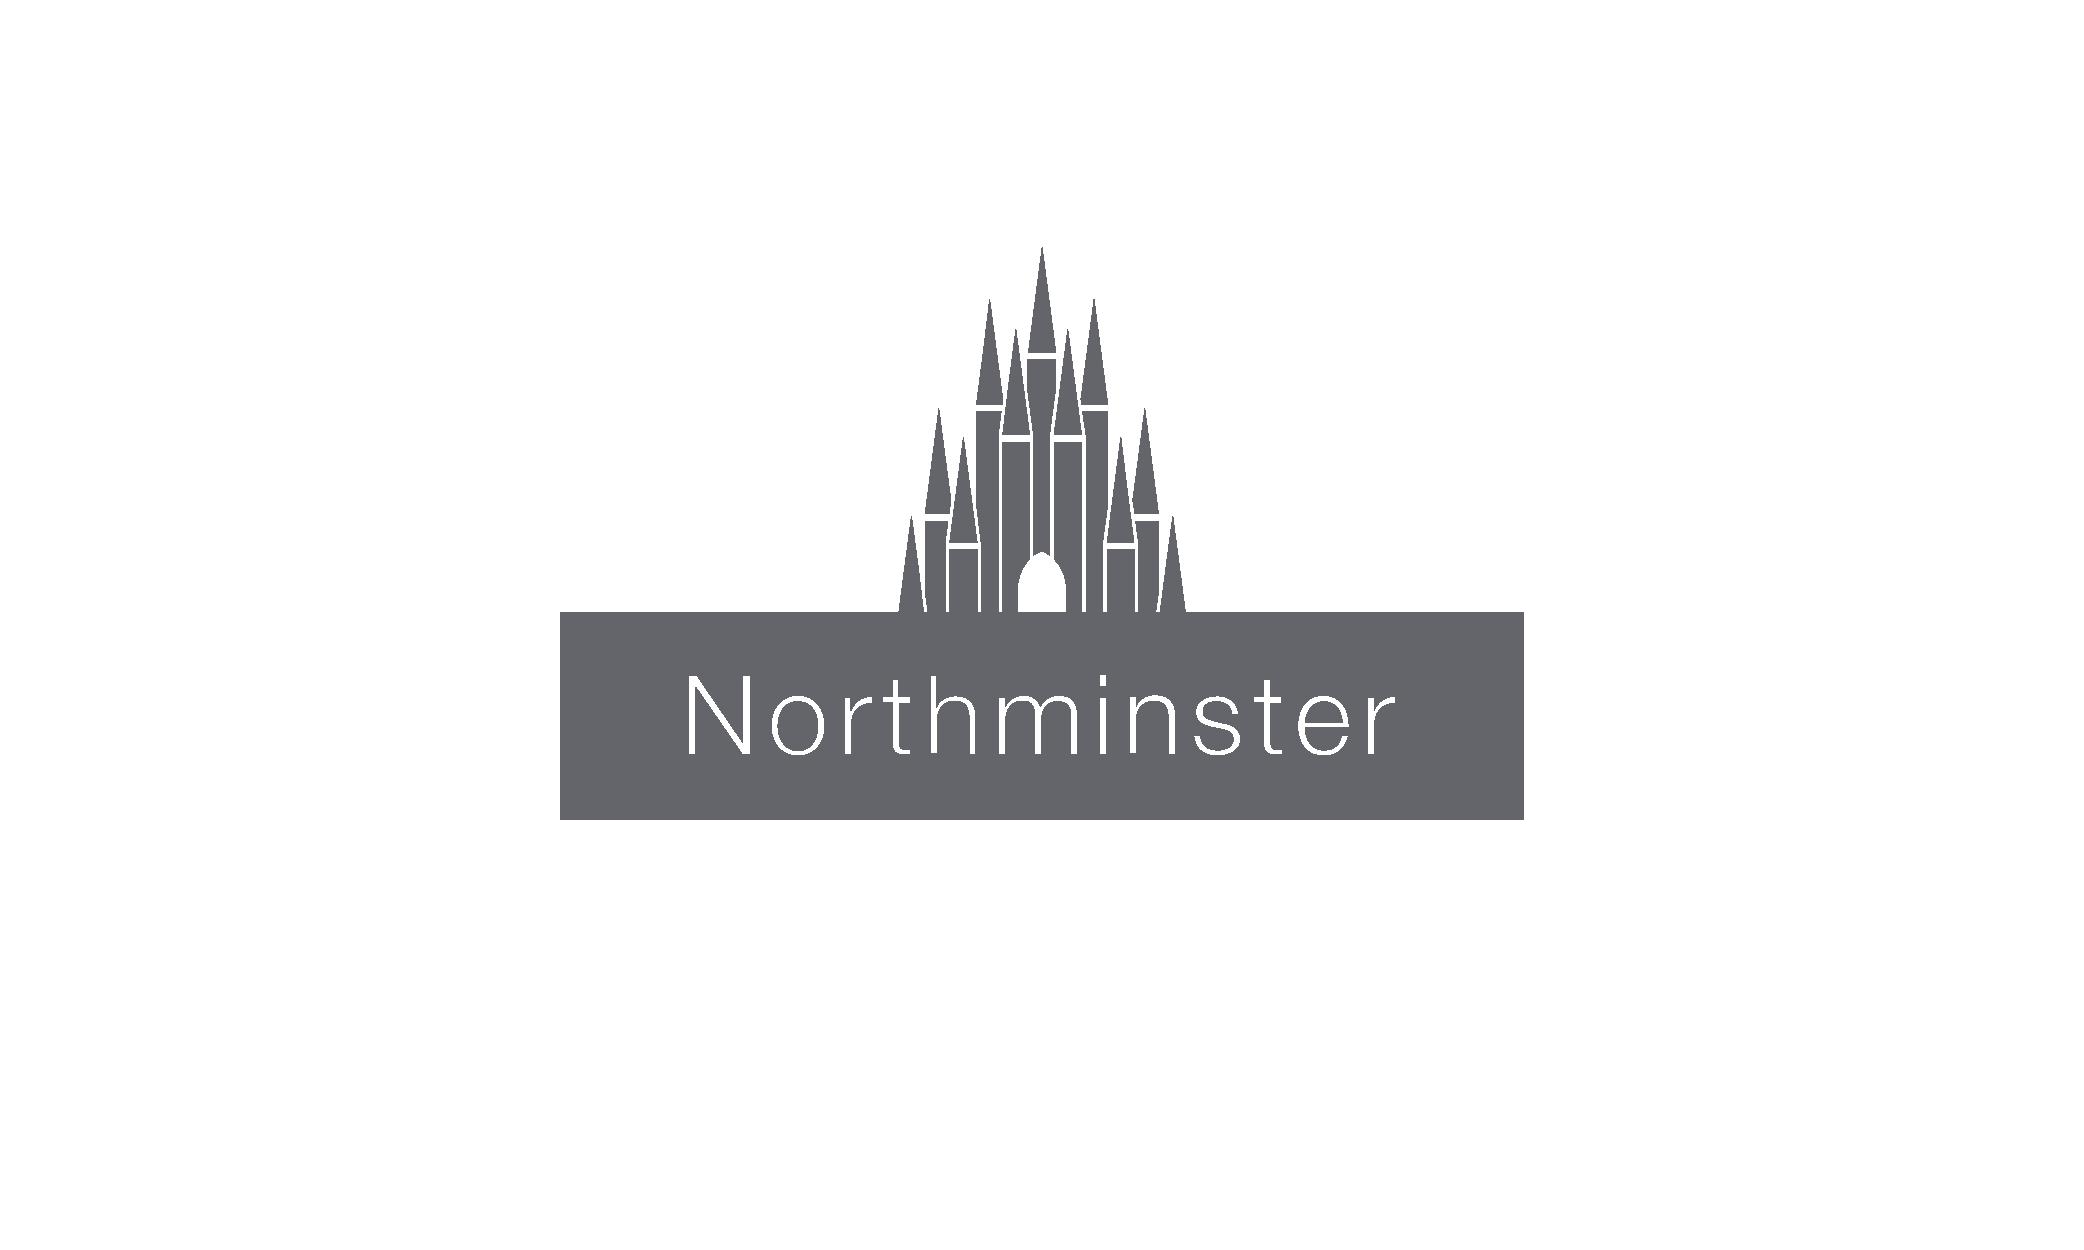 Kinetik_Client_Logos-05